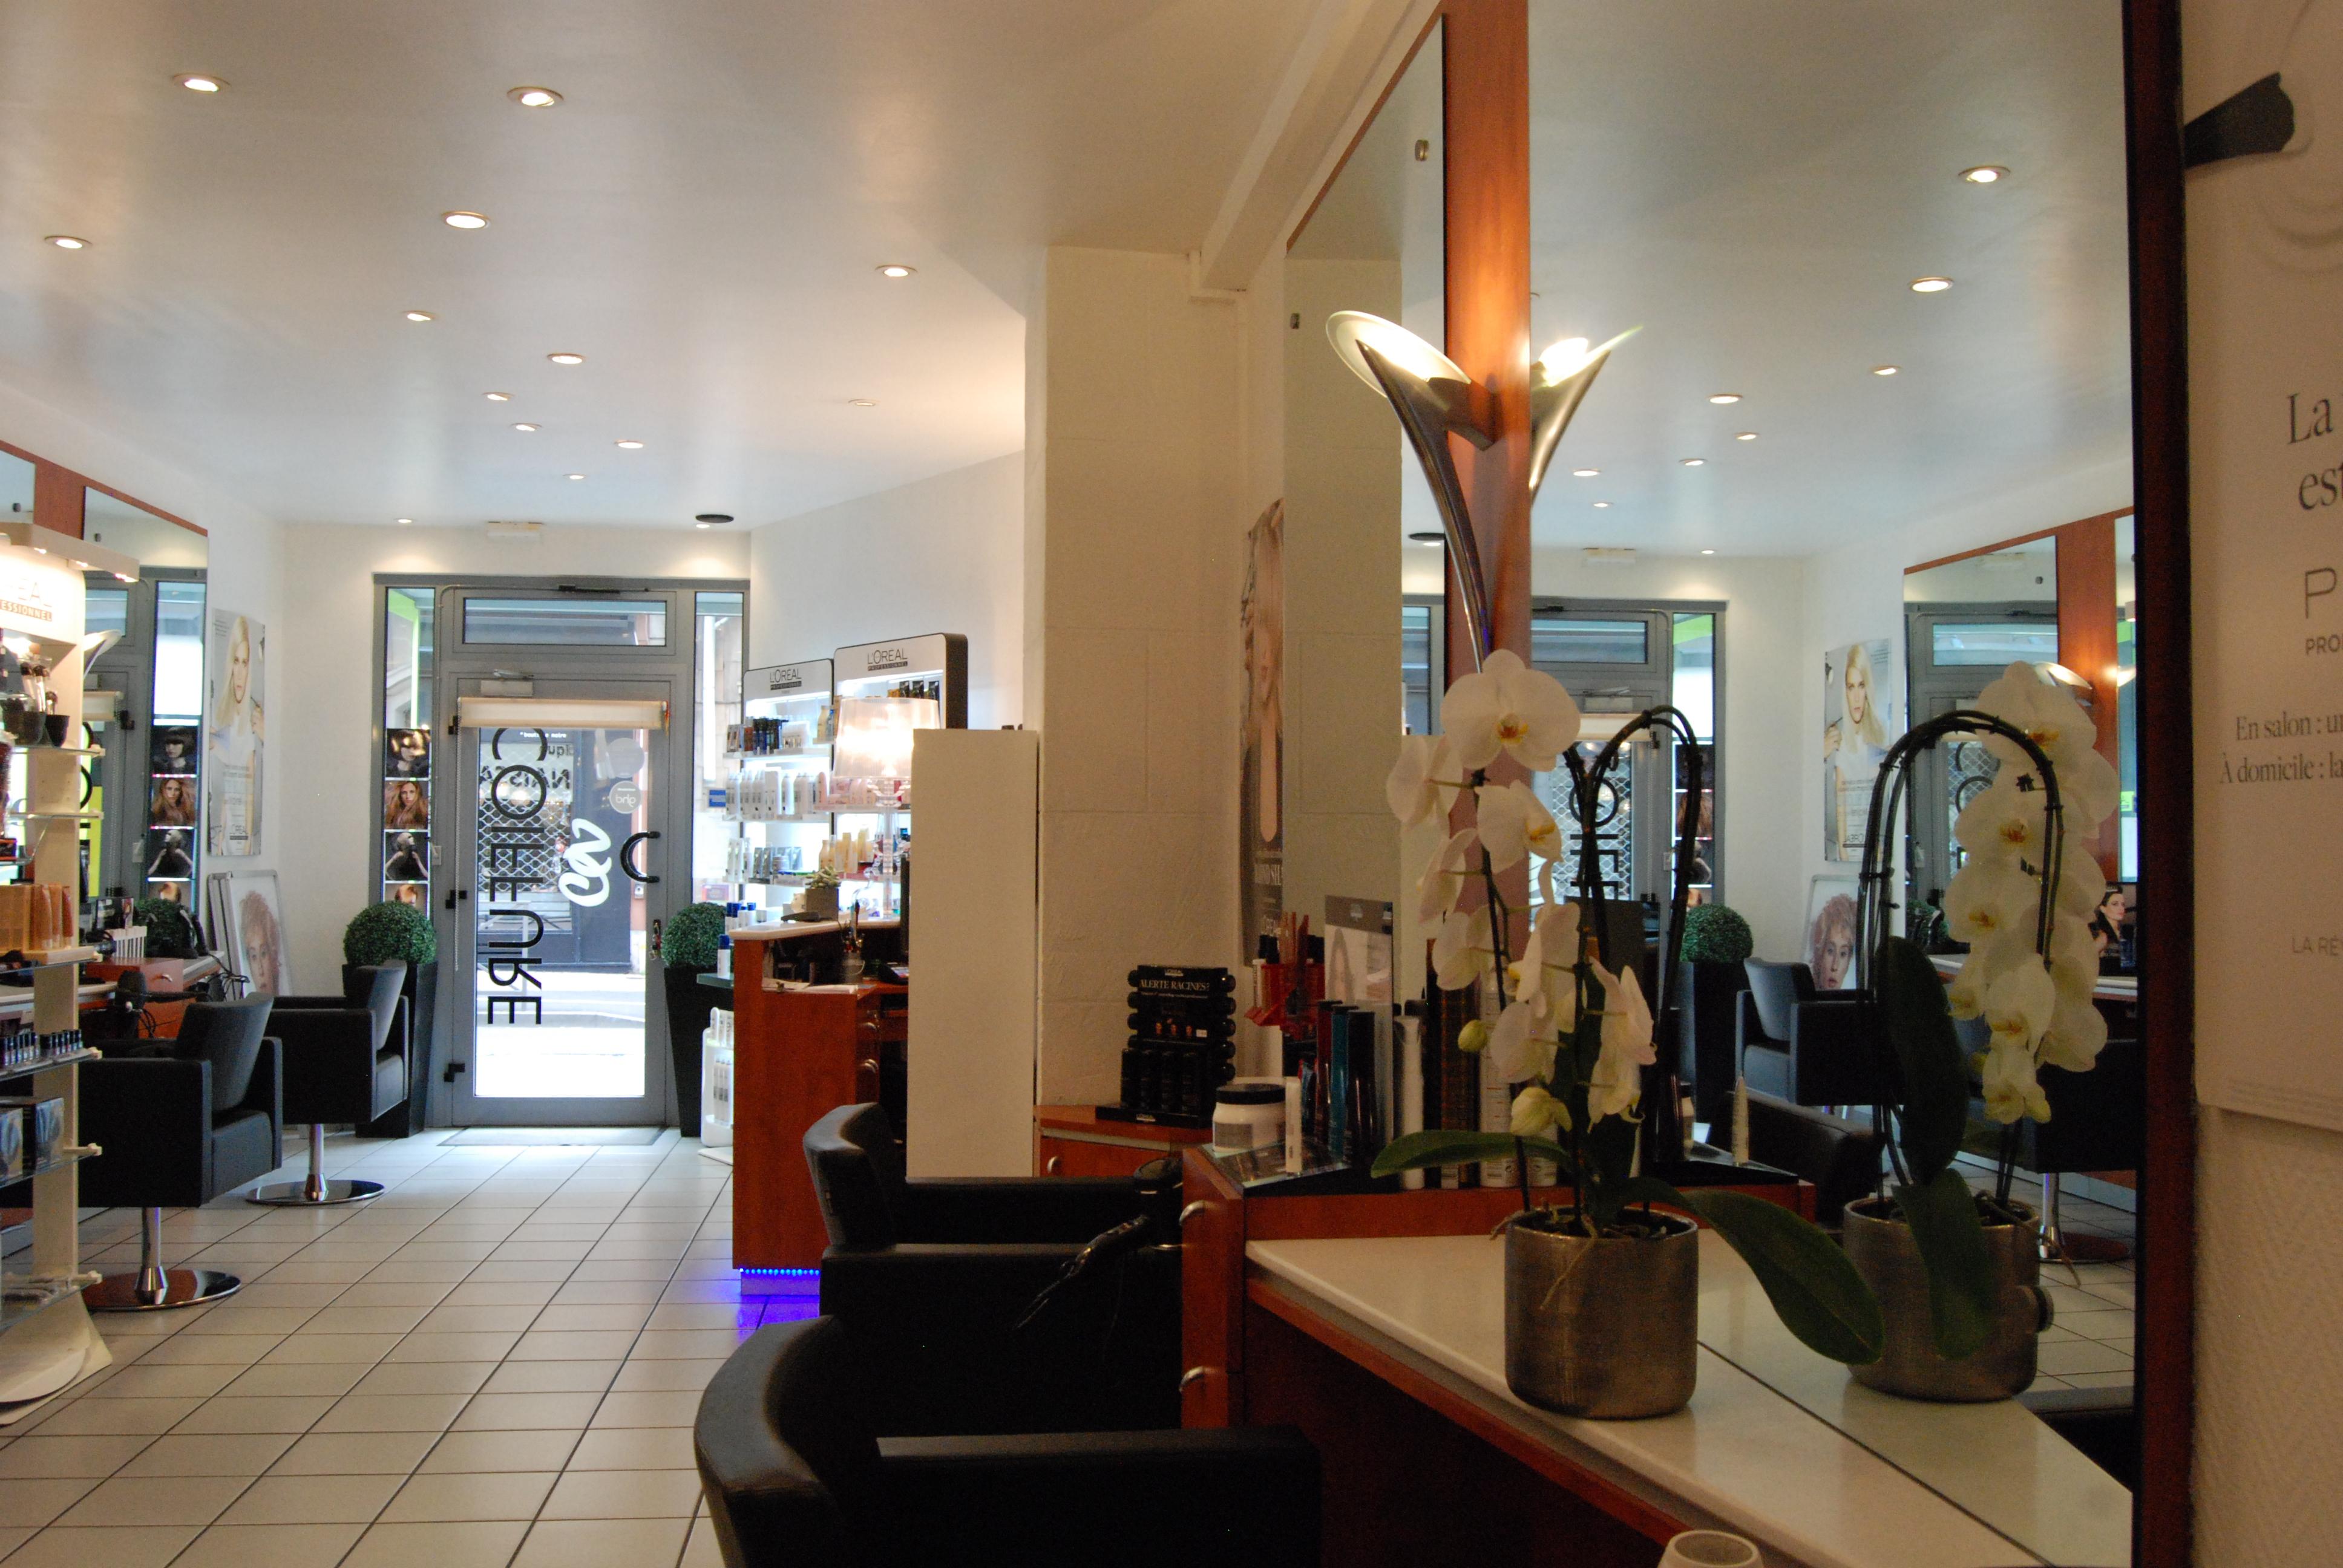 bon salon de coiffure belfort coiffures la mode de la